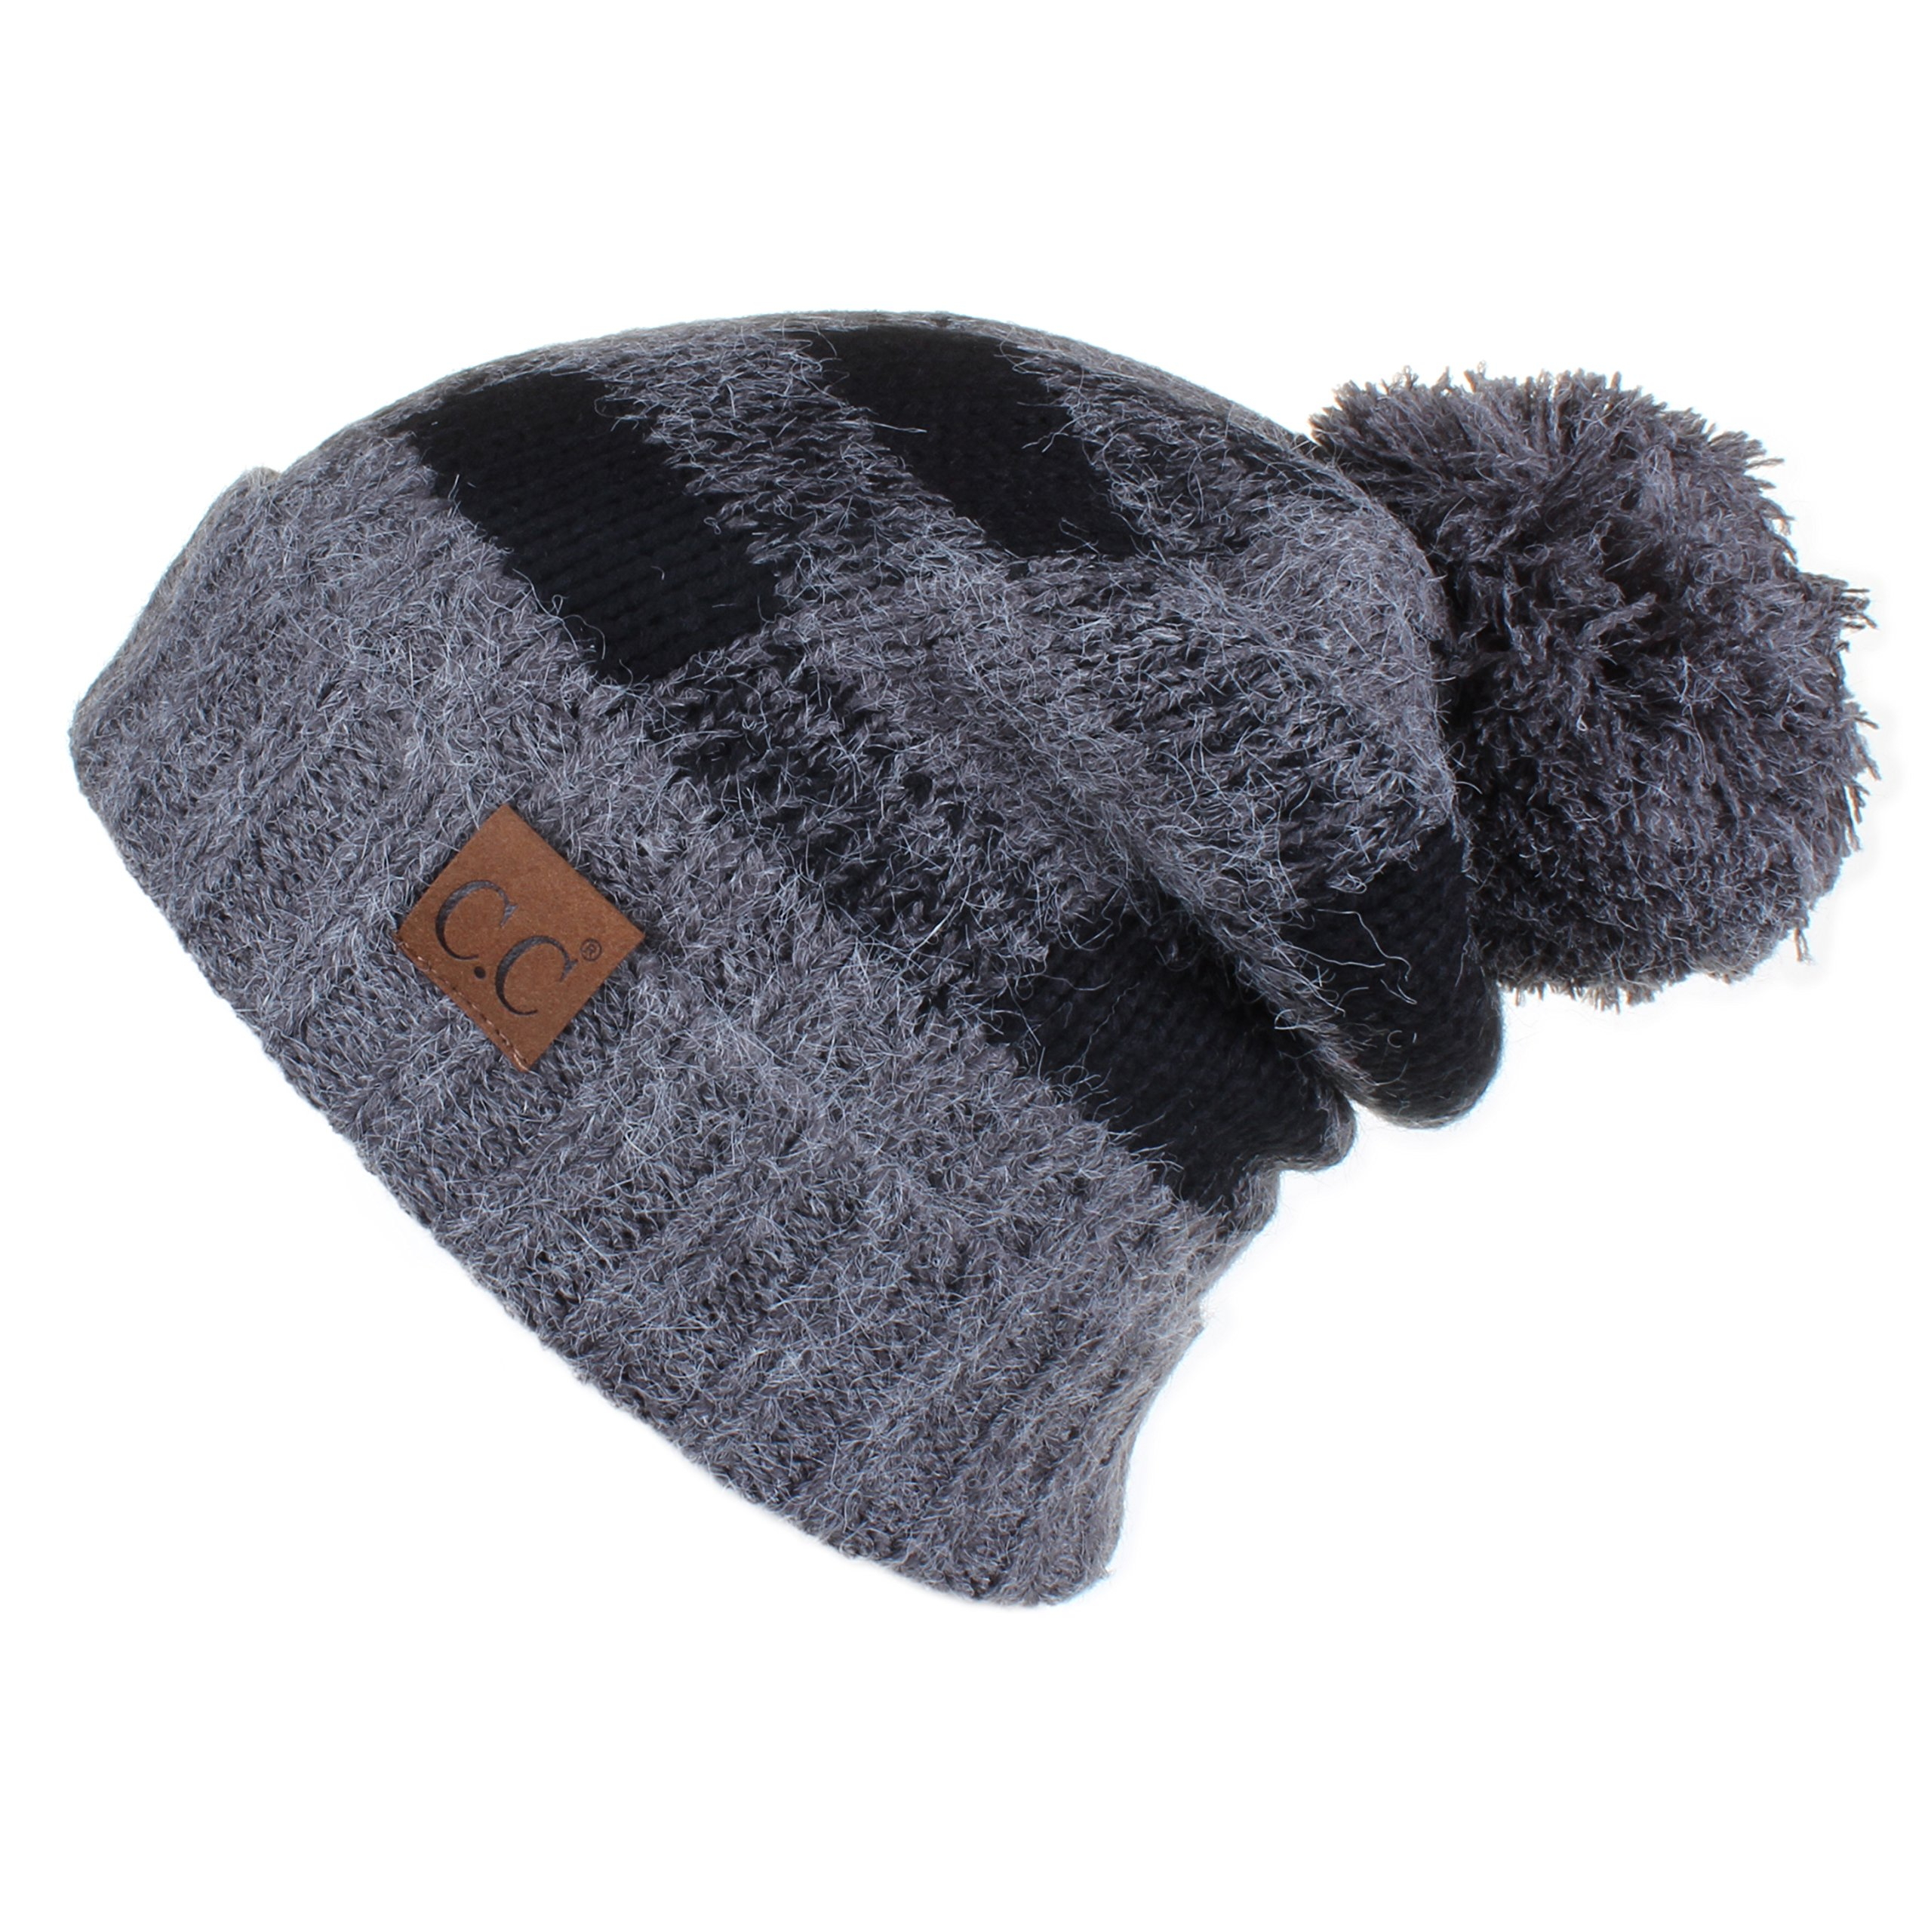 0307a55b2f4a2 Hatsandscarf CC Exclusives Buffalo Check Pattern Fuzzy Lined Knit Pom Beanie  Hat (HAT-55) (Dk.Mel Grey Black)